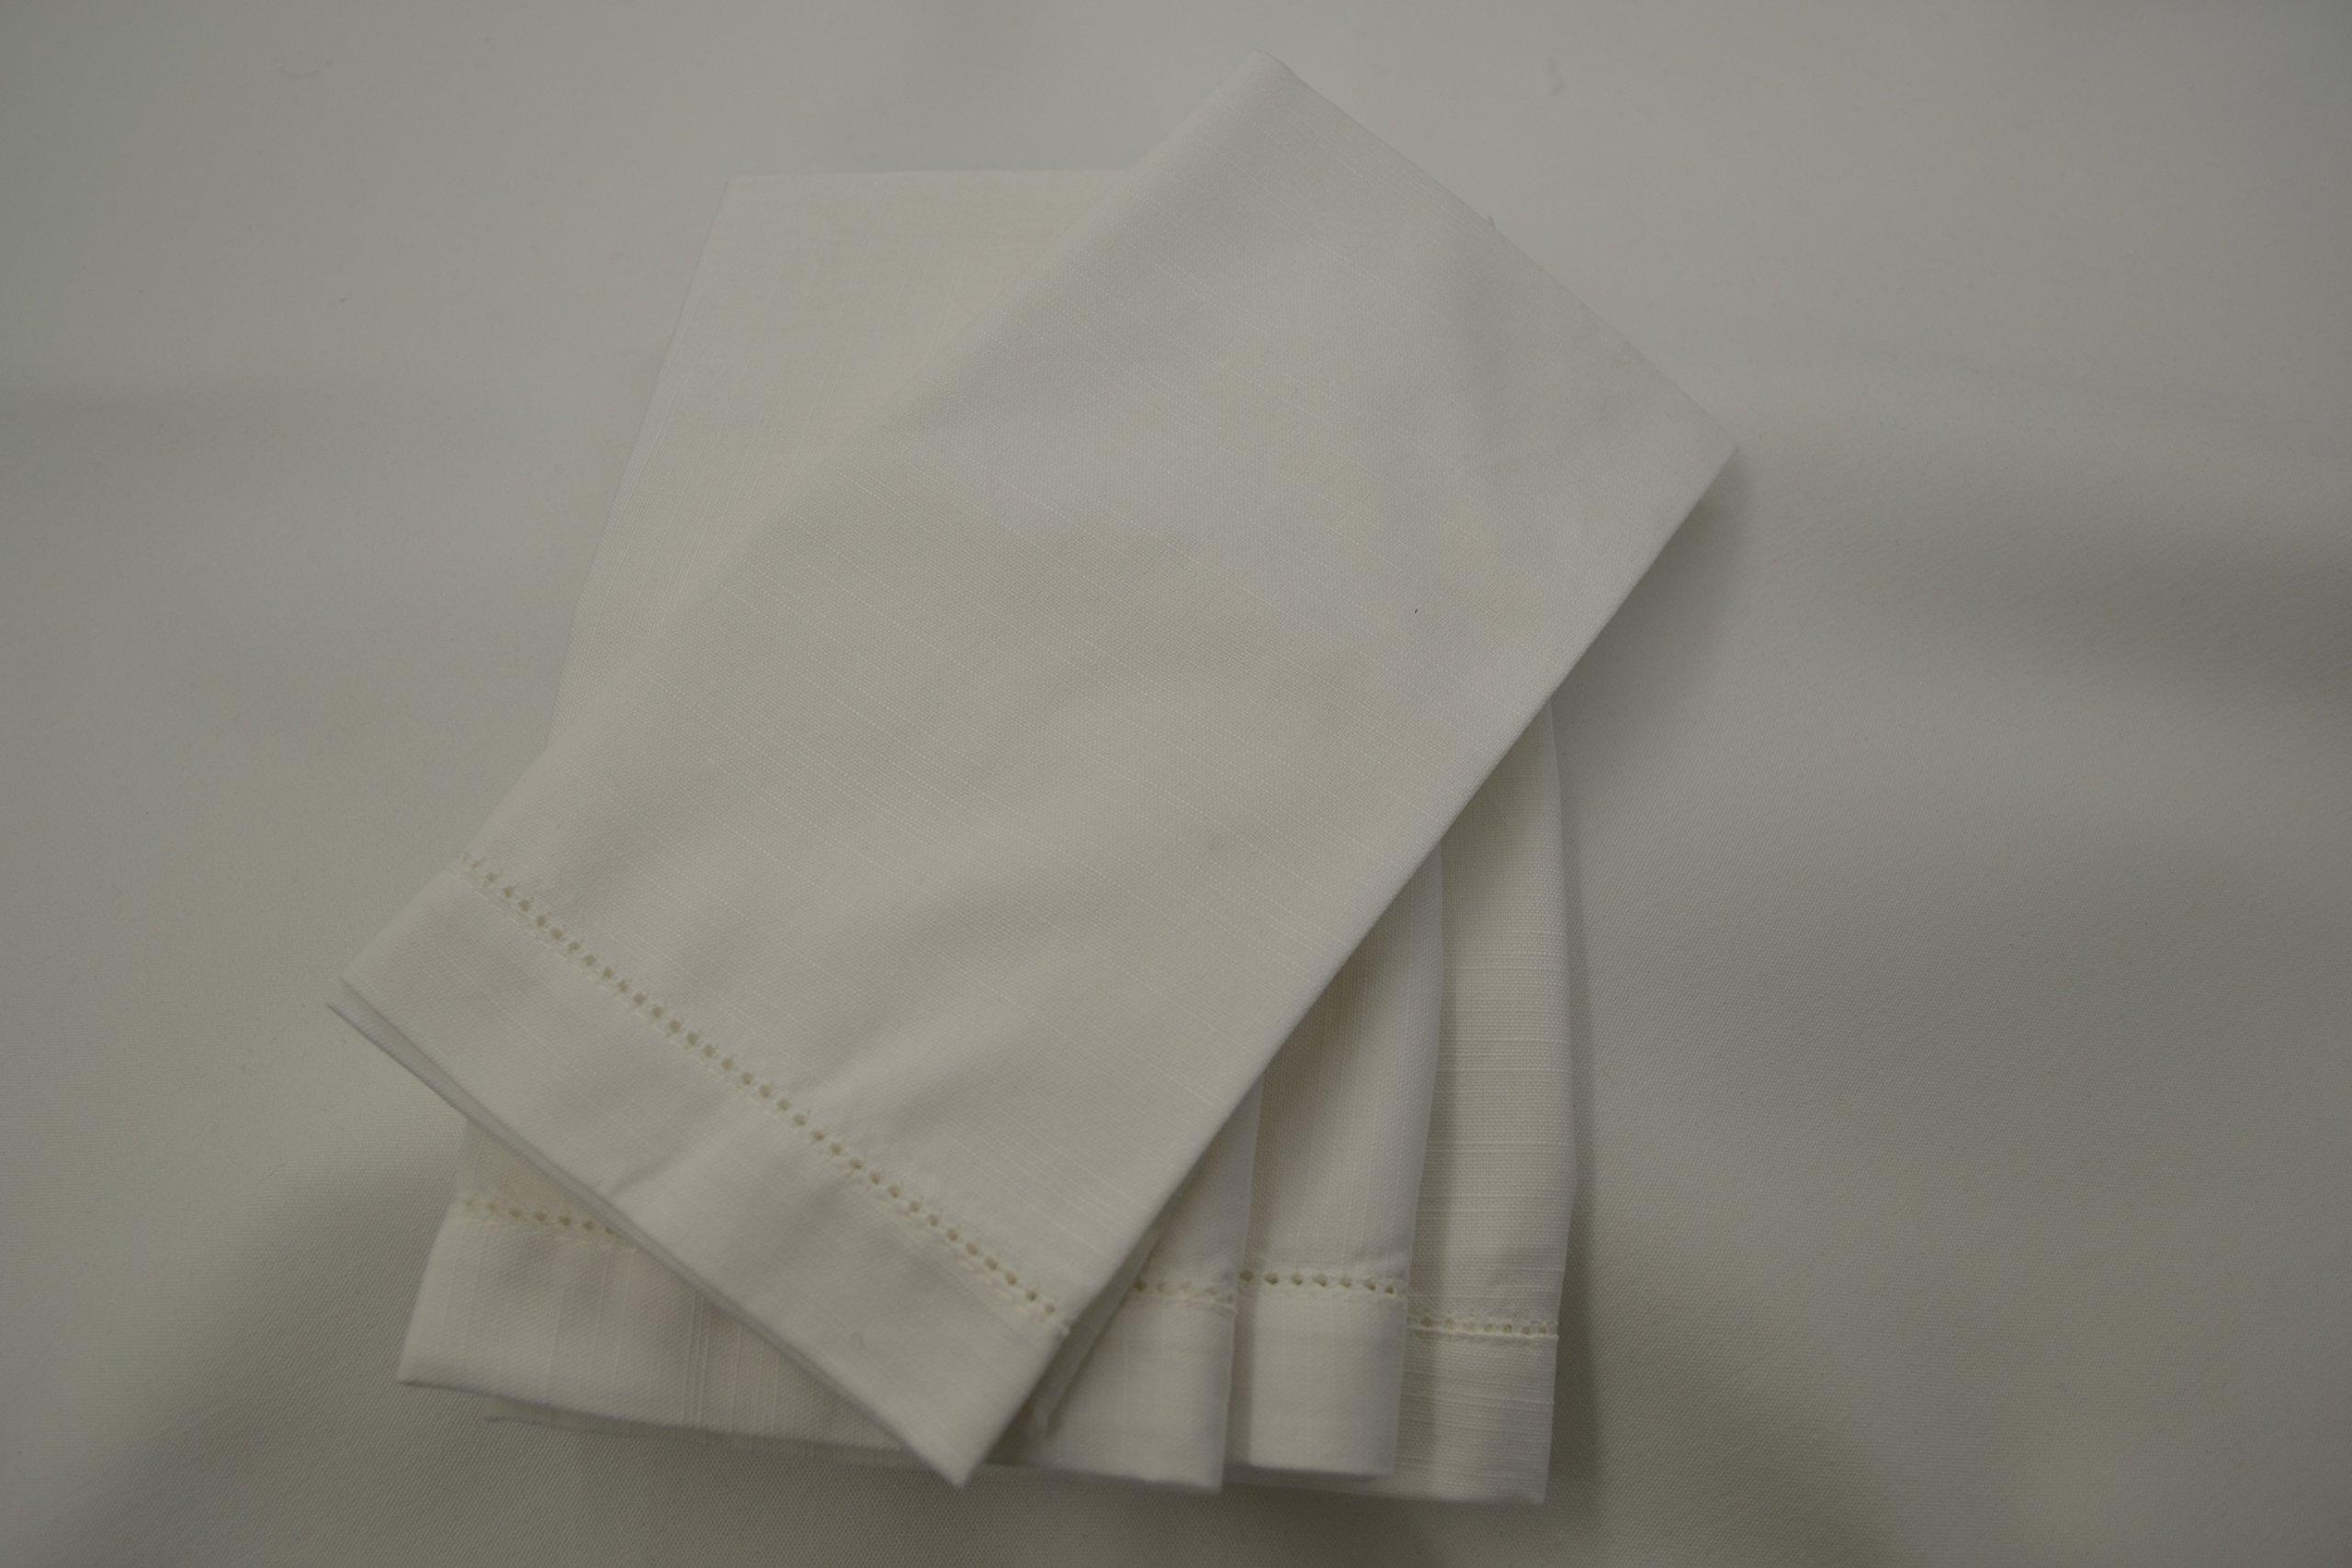 Hemstitch Dinner Napkins White 1 Dozen by Something Different Linen by Something Different Linen (Image #6)